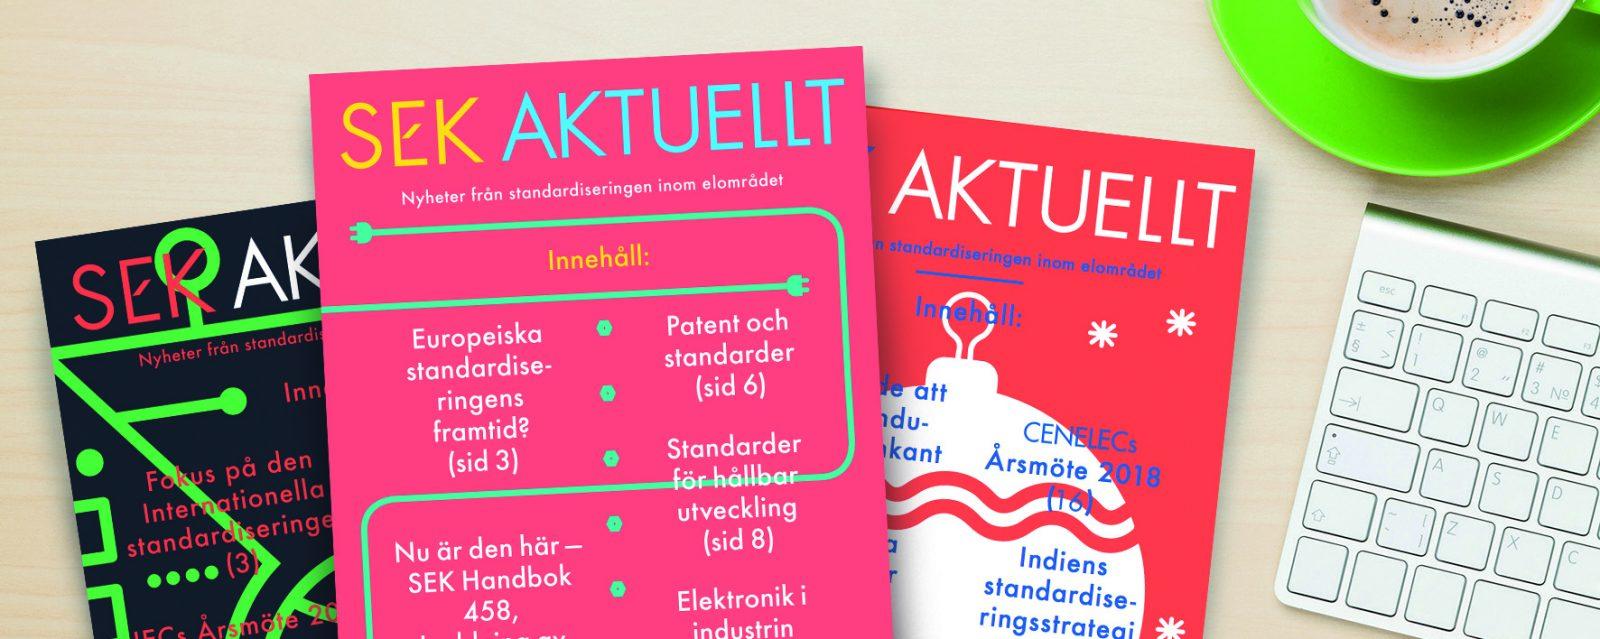 SEK-Aktuellt_SEK Svensk Elstandard